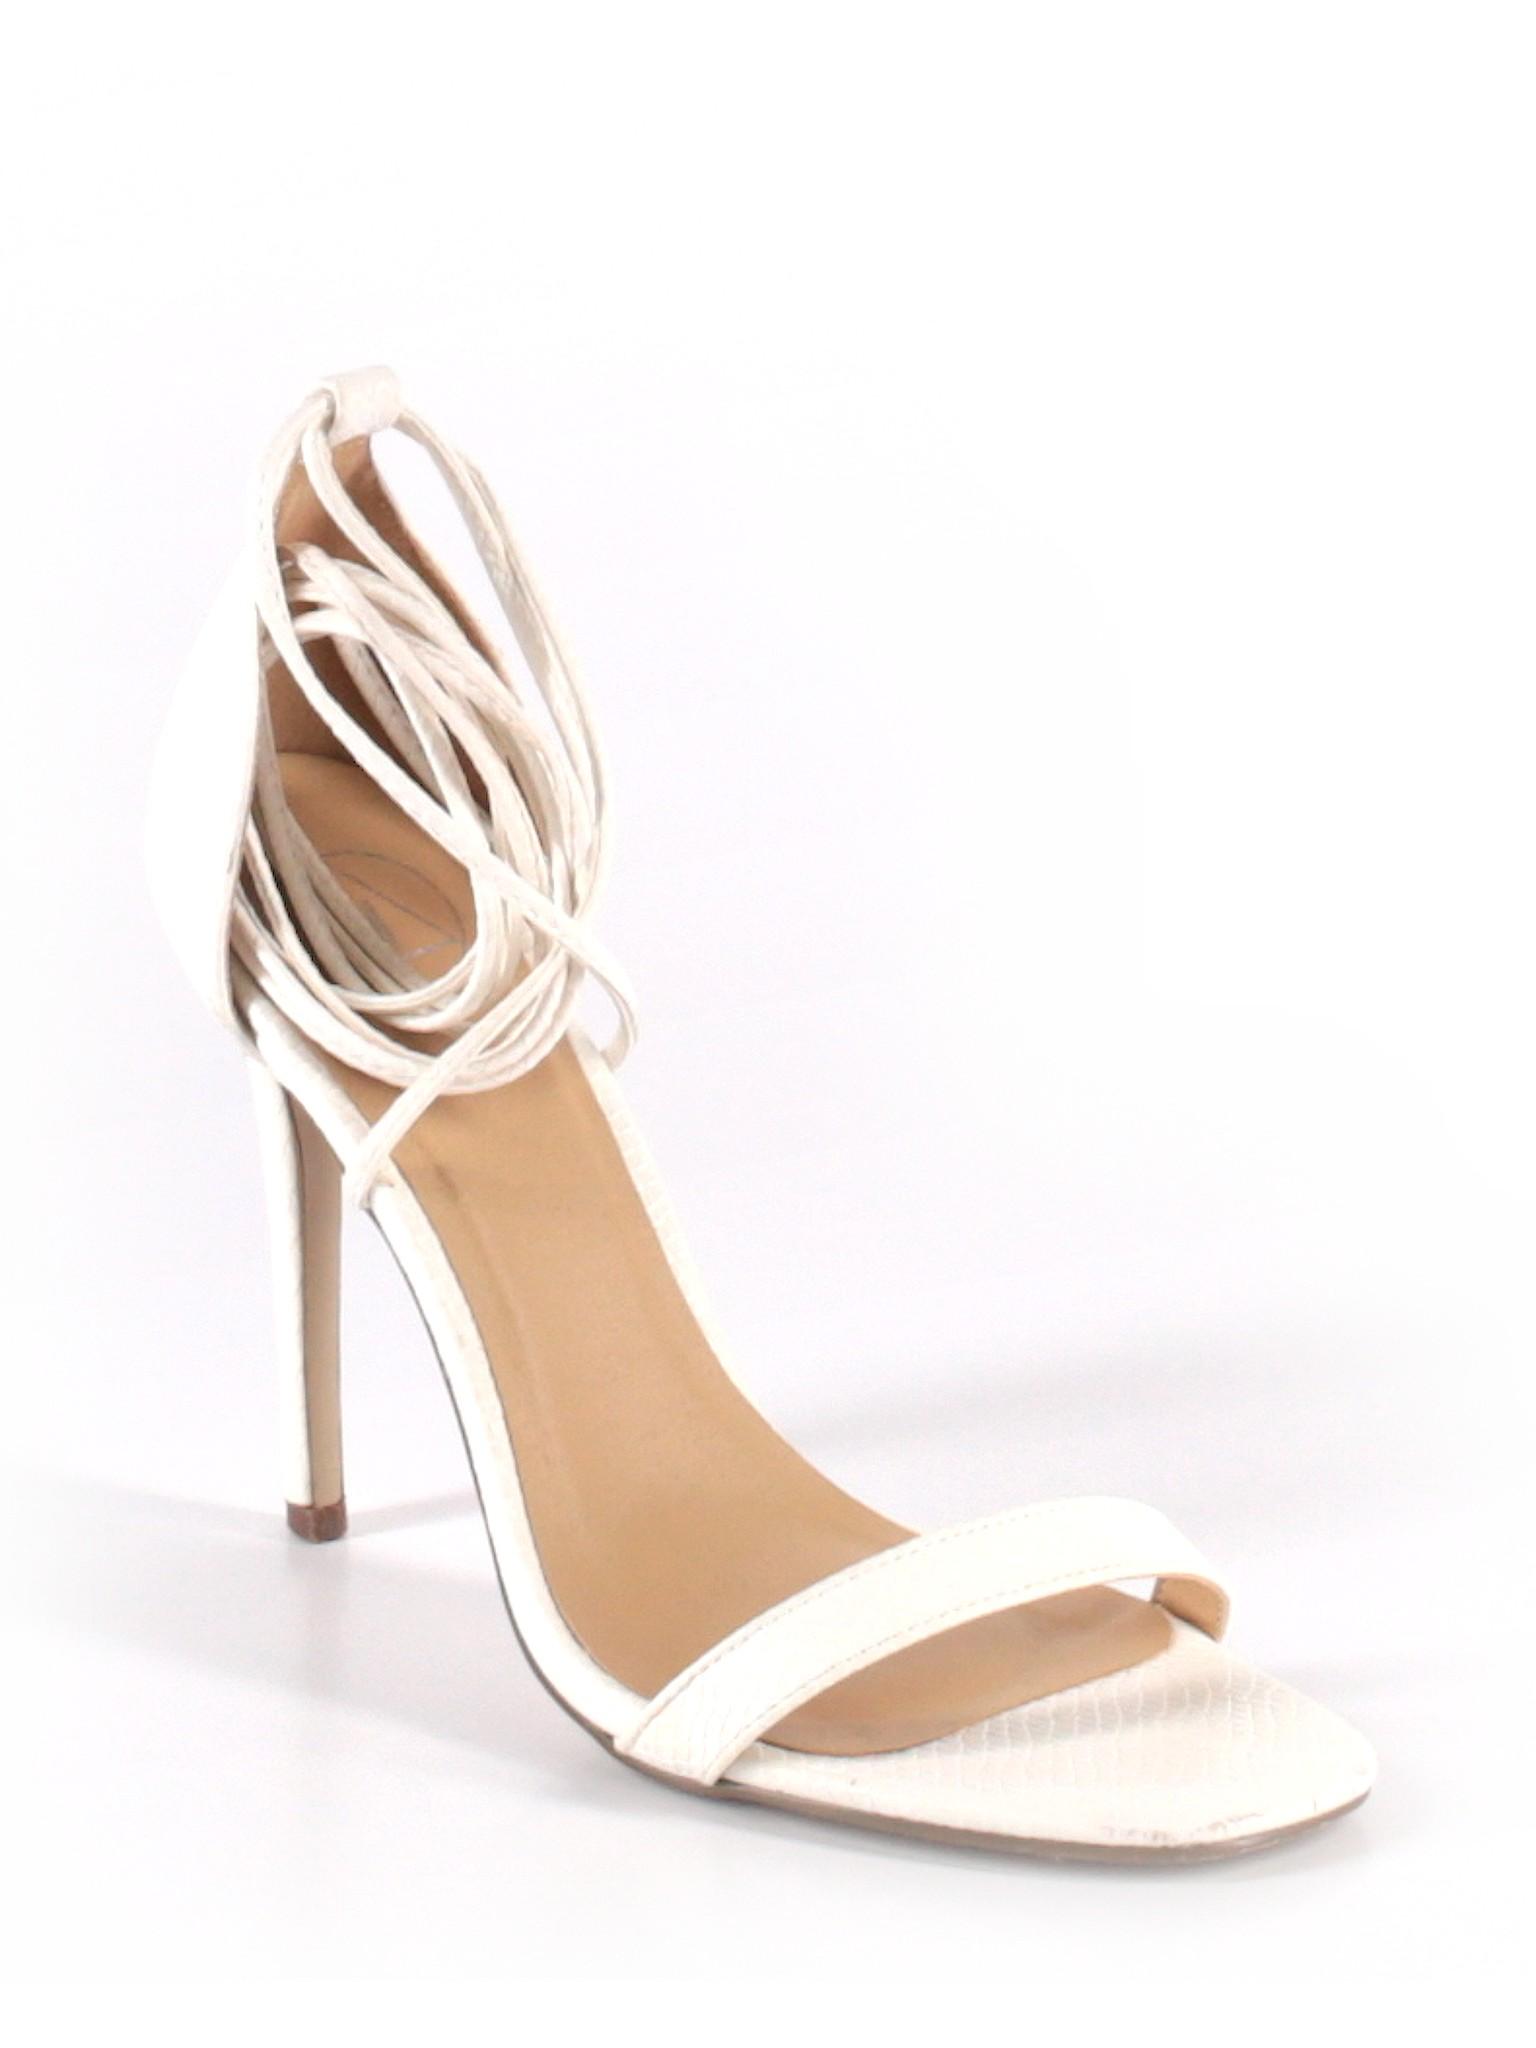 Miss Boutique Heels Guided Boutique Heels promotion Miss promotion Miss Boutique Guided Guided promotion vIaqHrPxwv